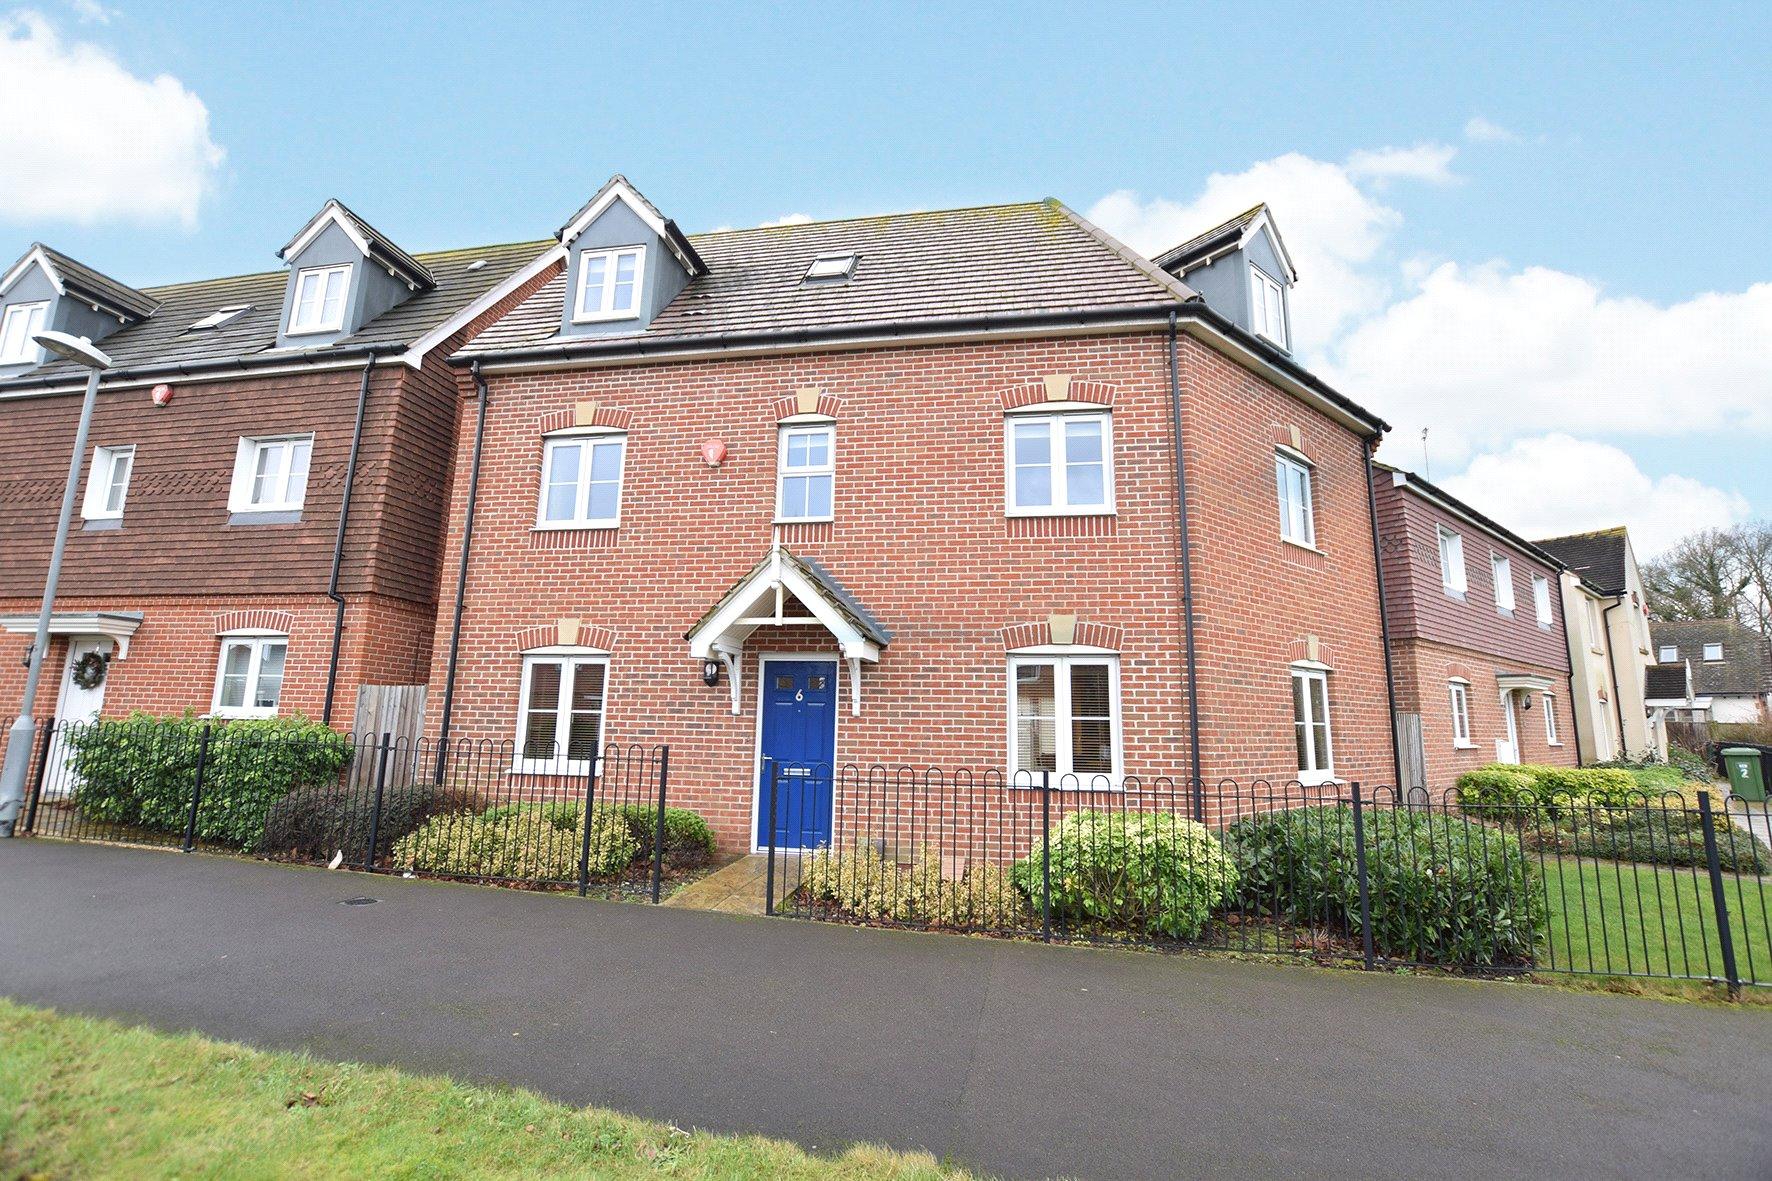 4 Bedrooms Detached House for sale in Sparrowhawk Way, Jennett's Park, Bracknell, Berkshire, RG12